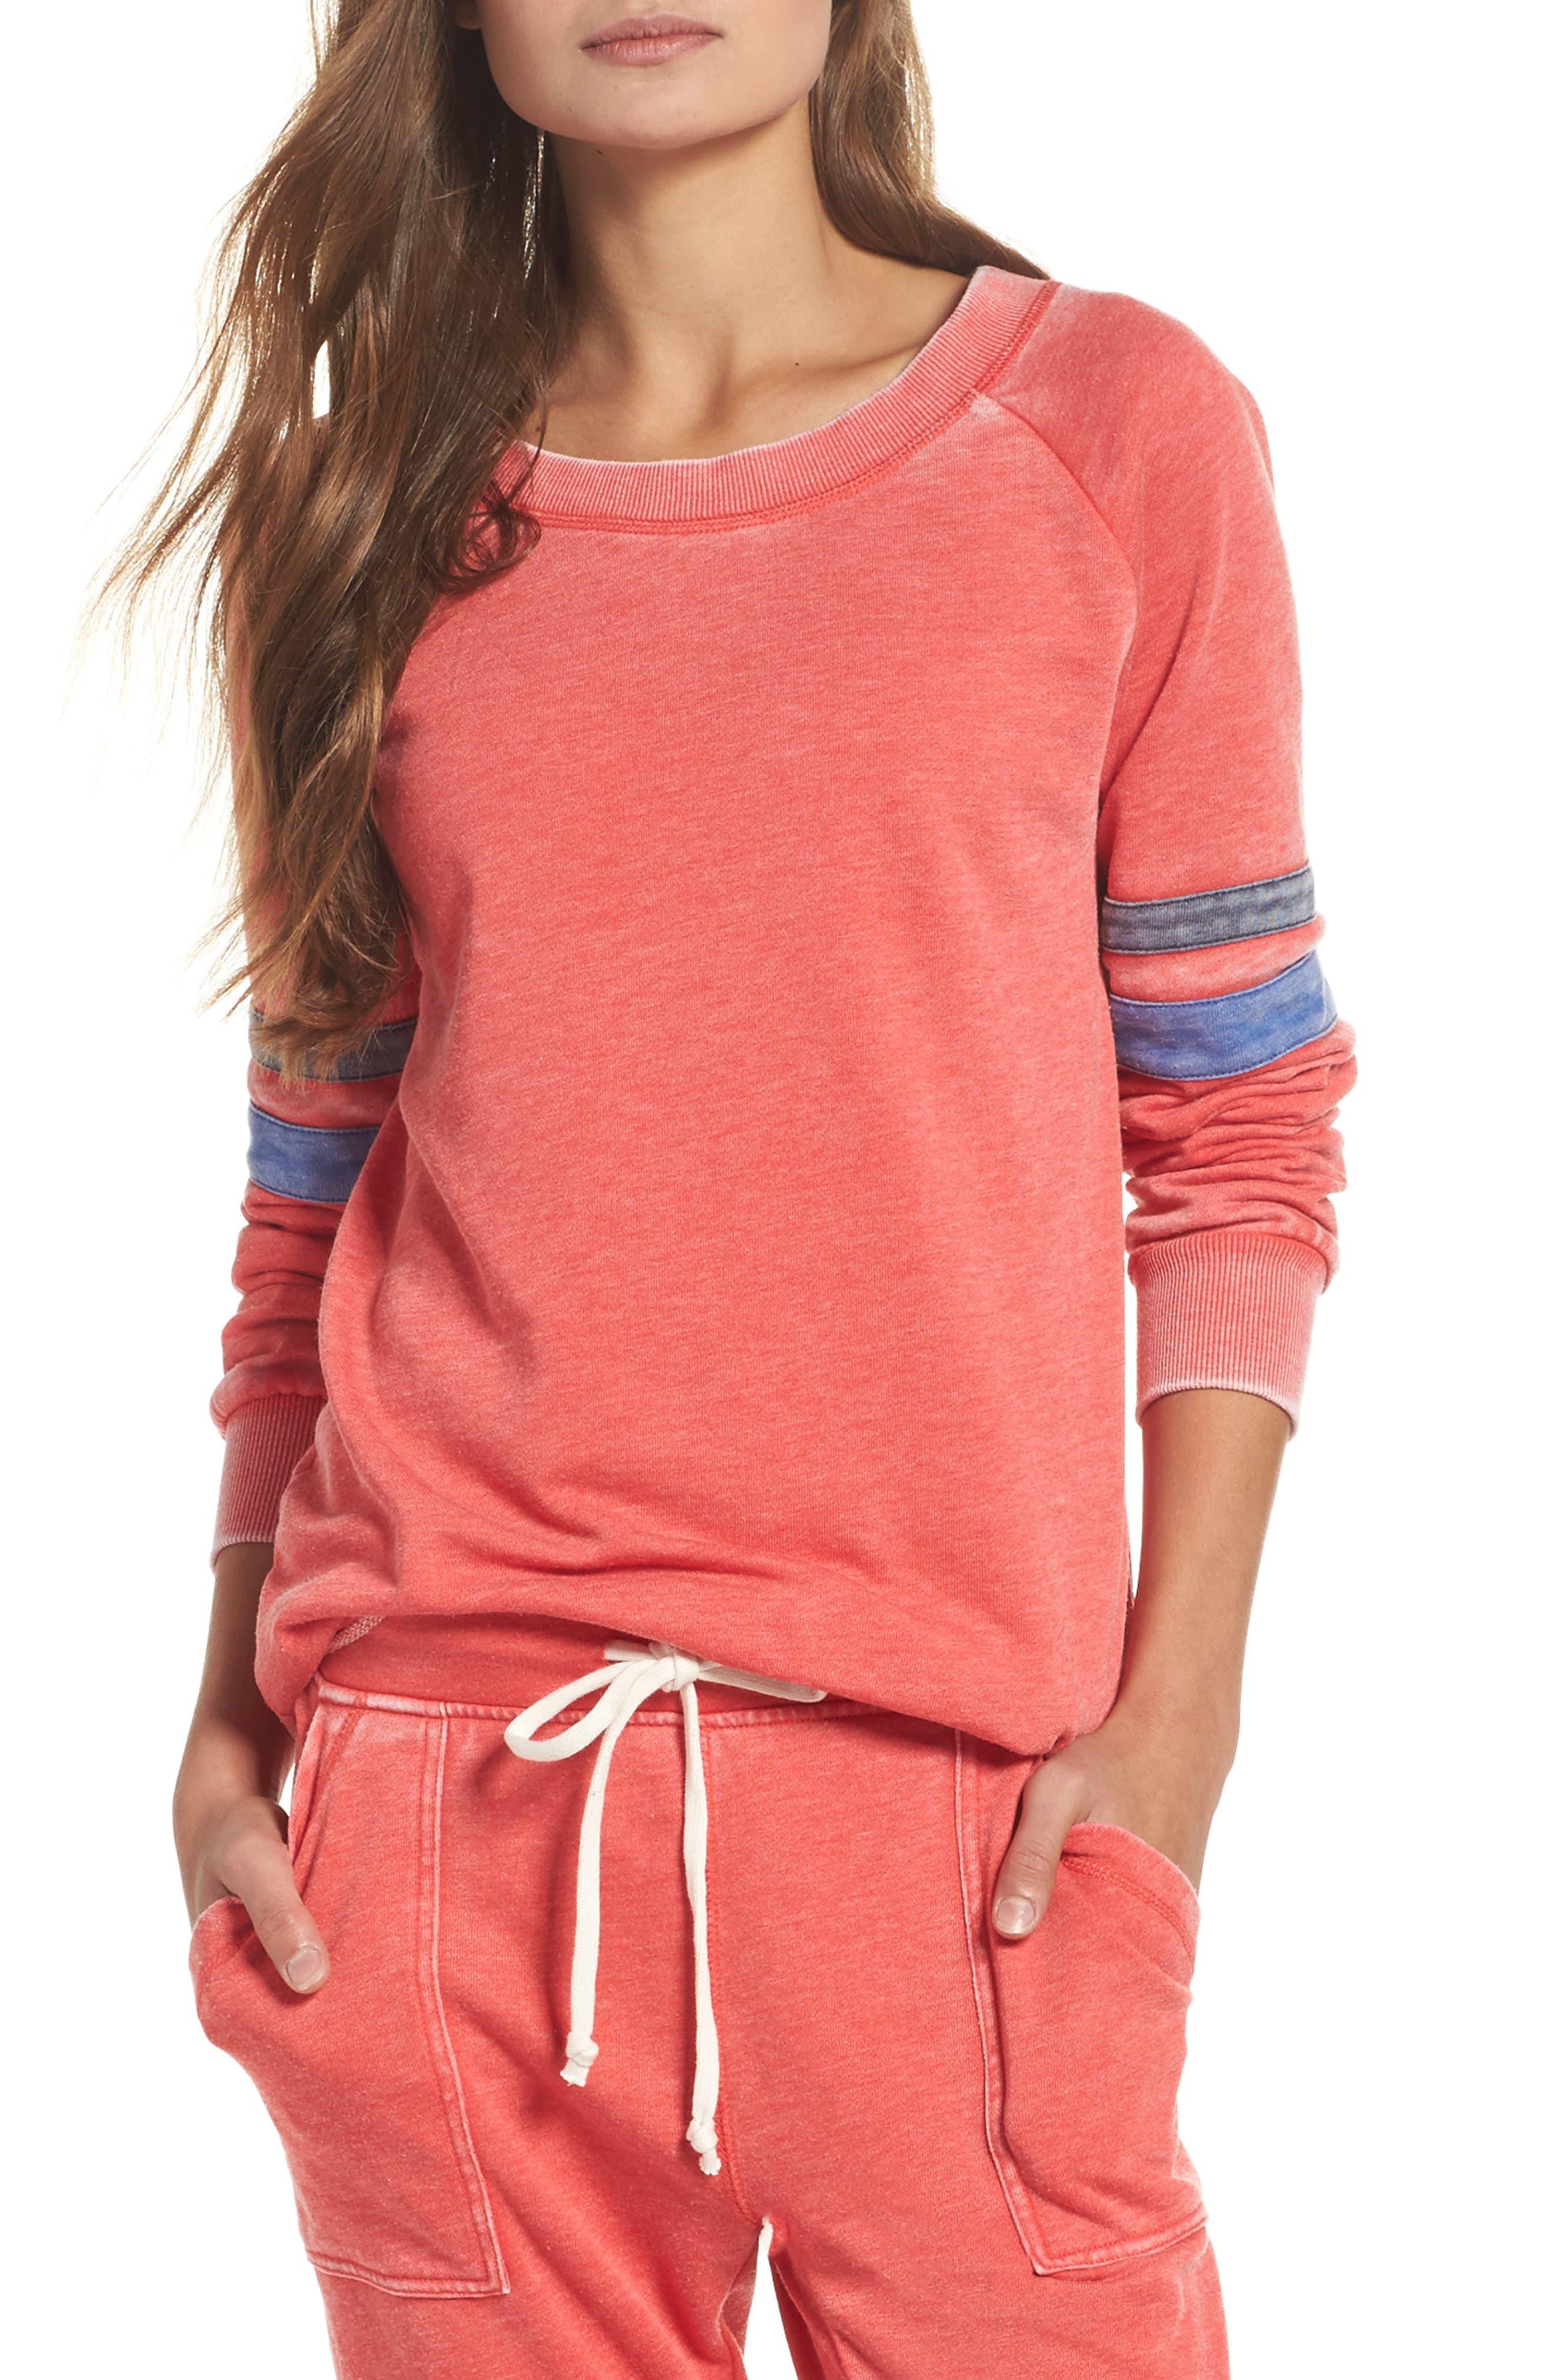 Lazy Day Sweatshirt,                             Main thumbnail 1, color,                             600